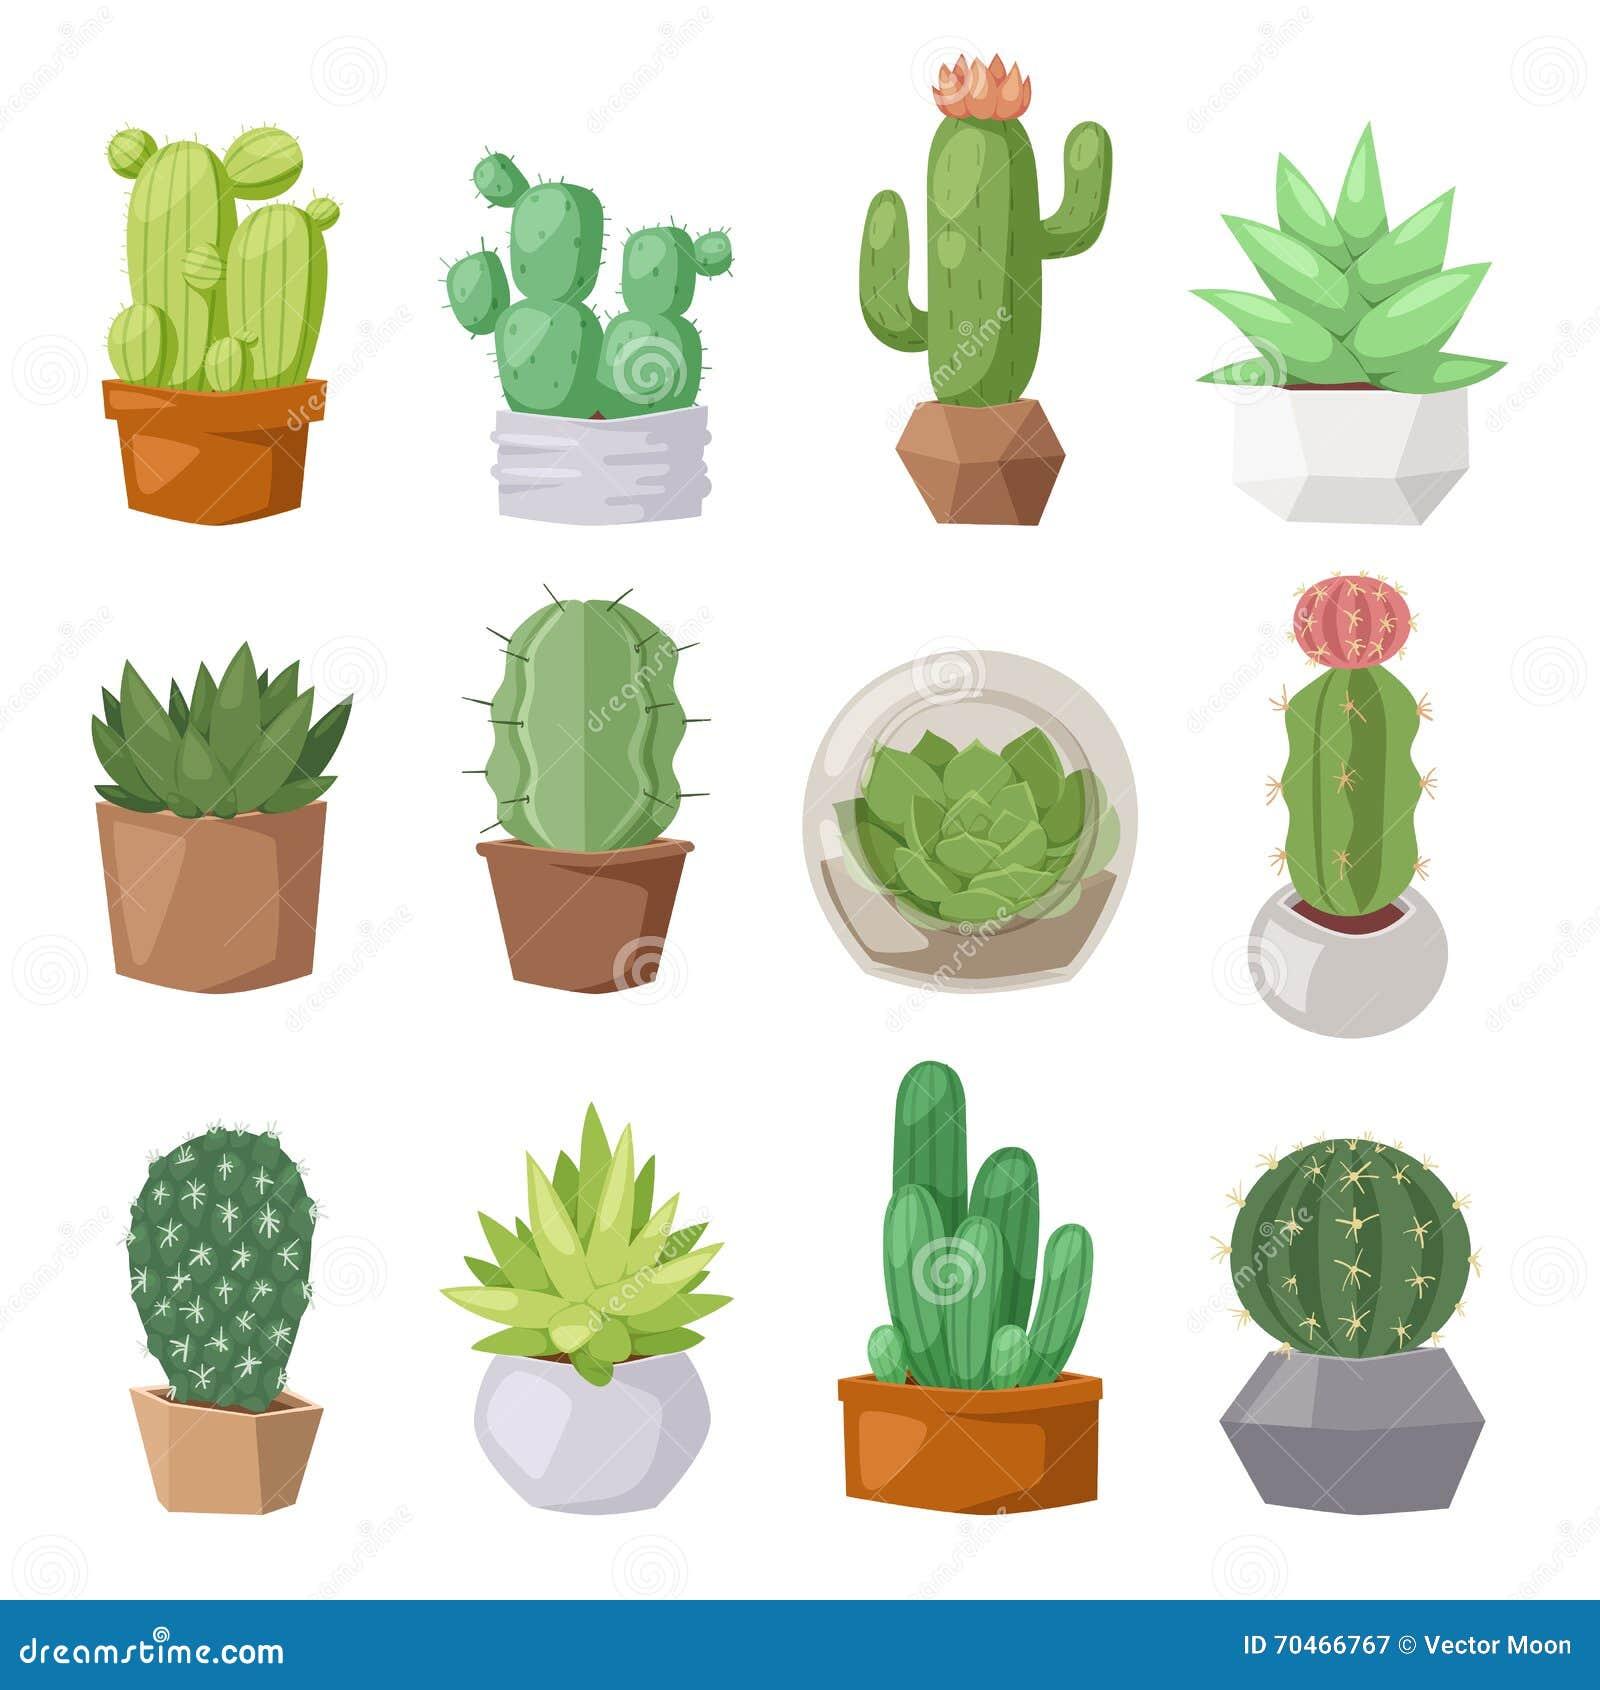 Cute Cartoon Cactus Collection Flat Nature Vector